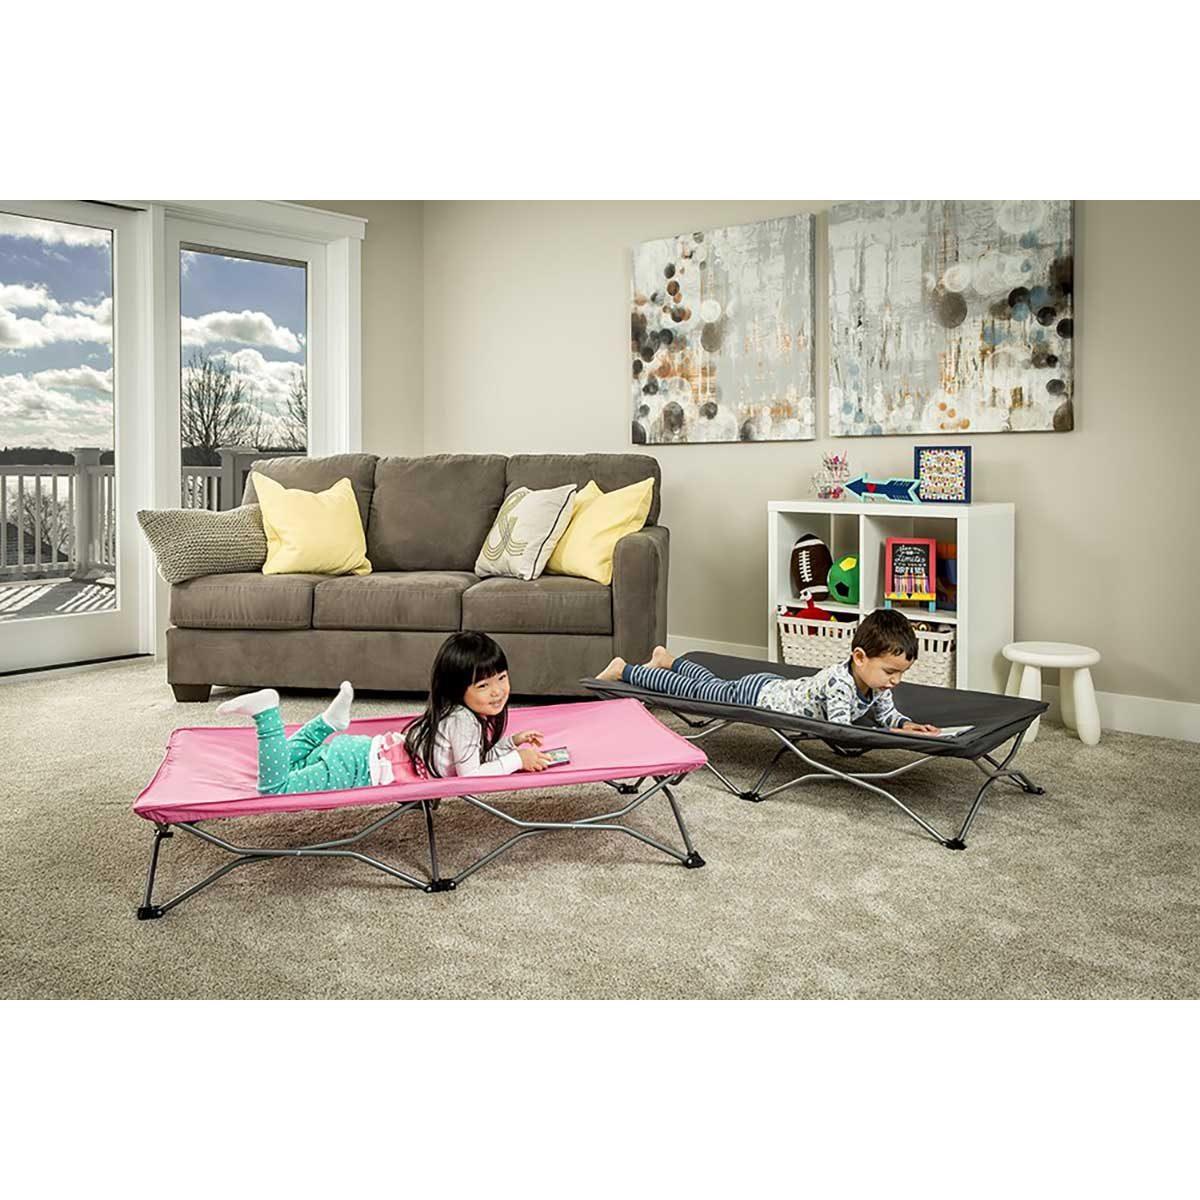 best folding beds for hosting guests